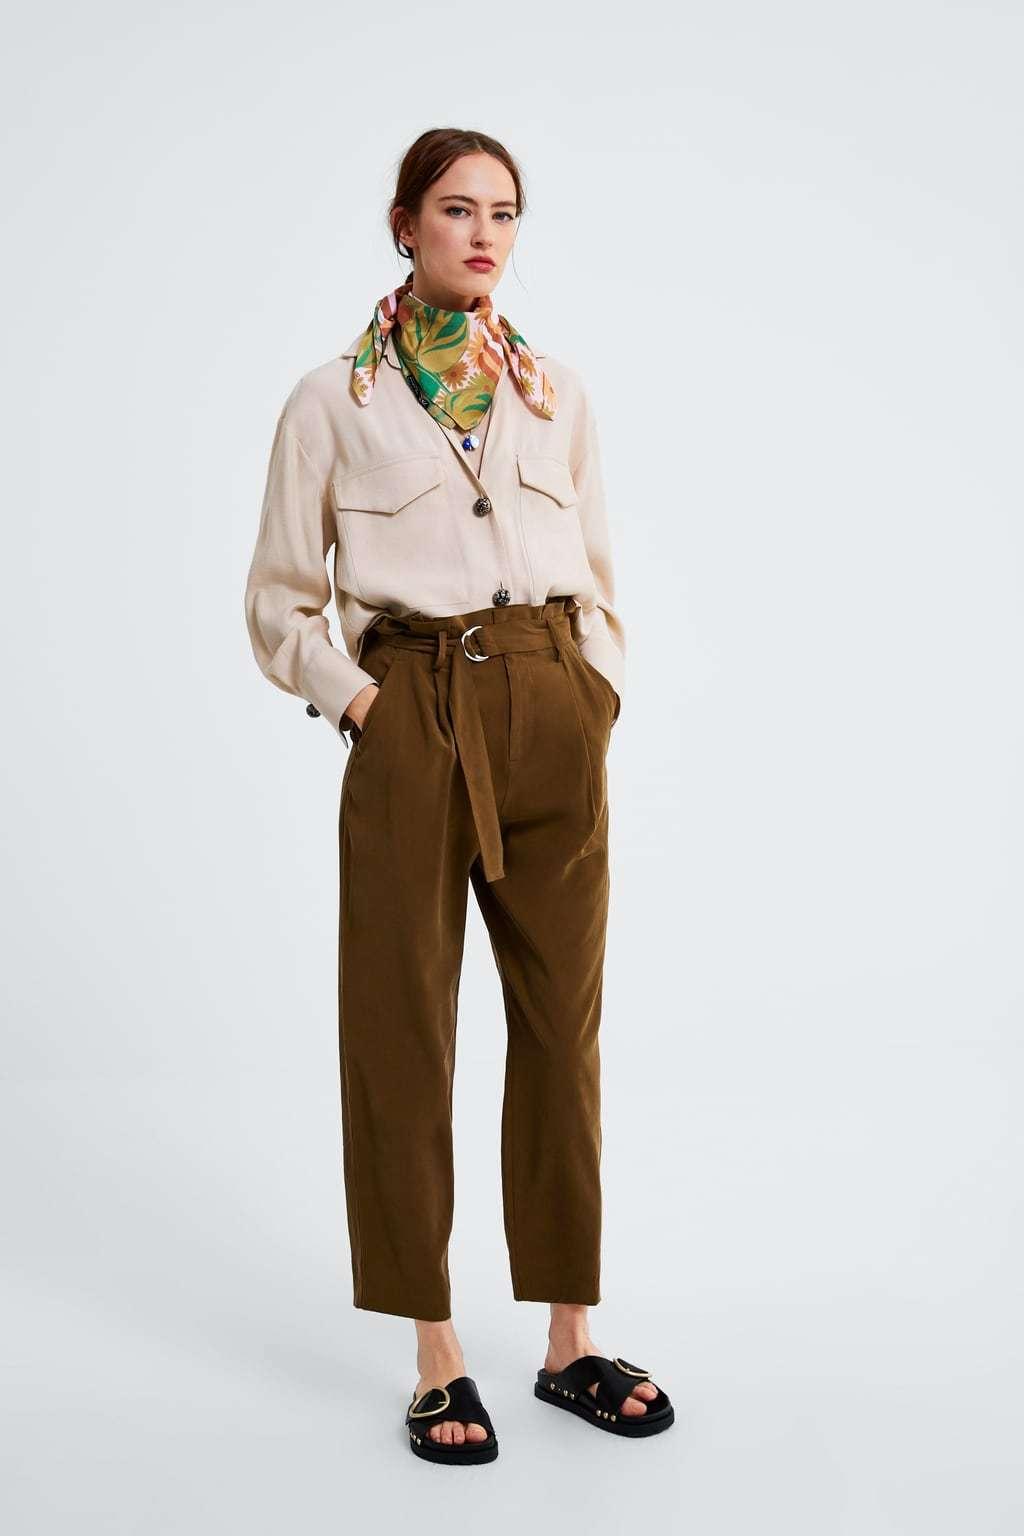 Camisa con bolsillos delanteros, de Zara (29,95 euros).